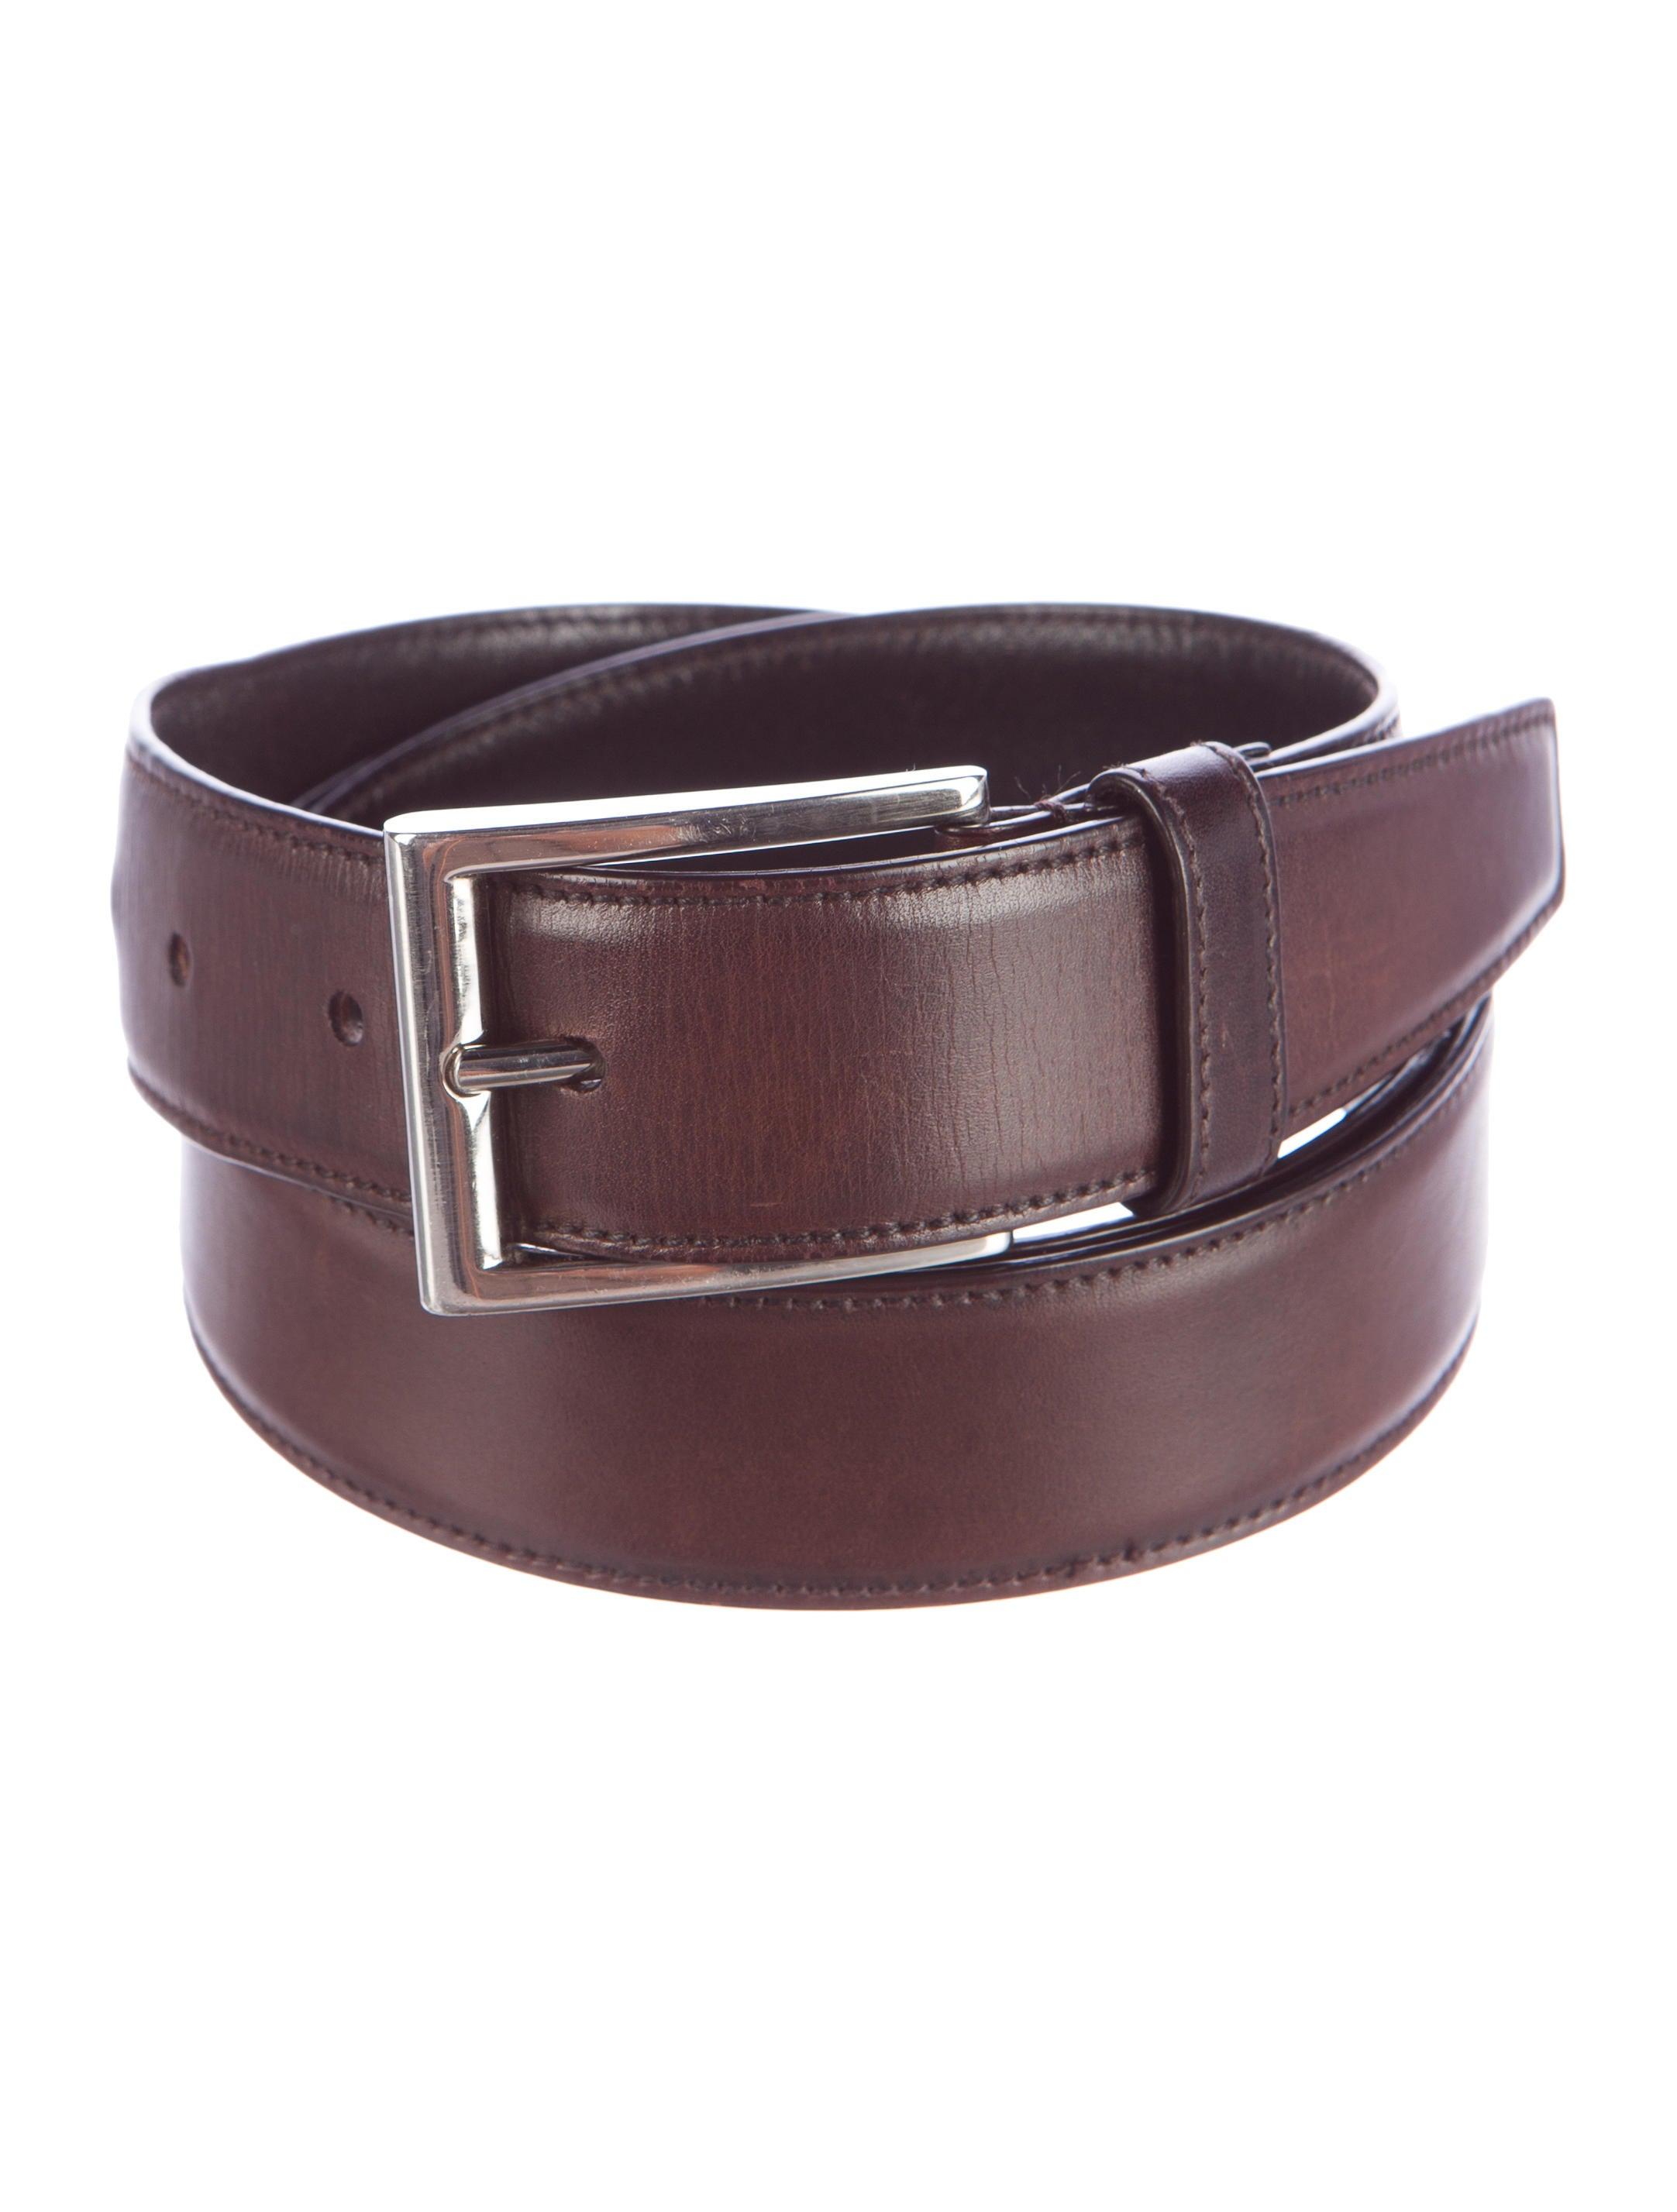 prada leather buckle belt accessories pra100270 the